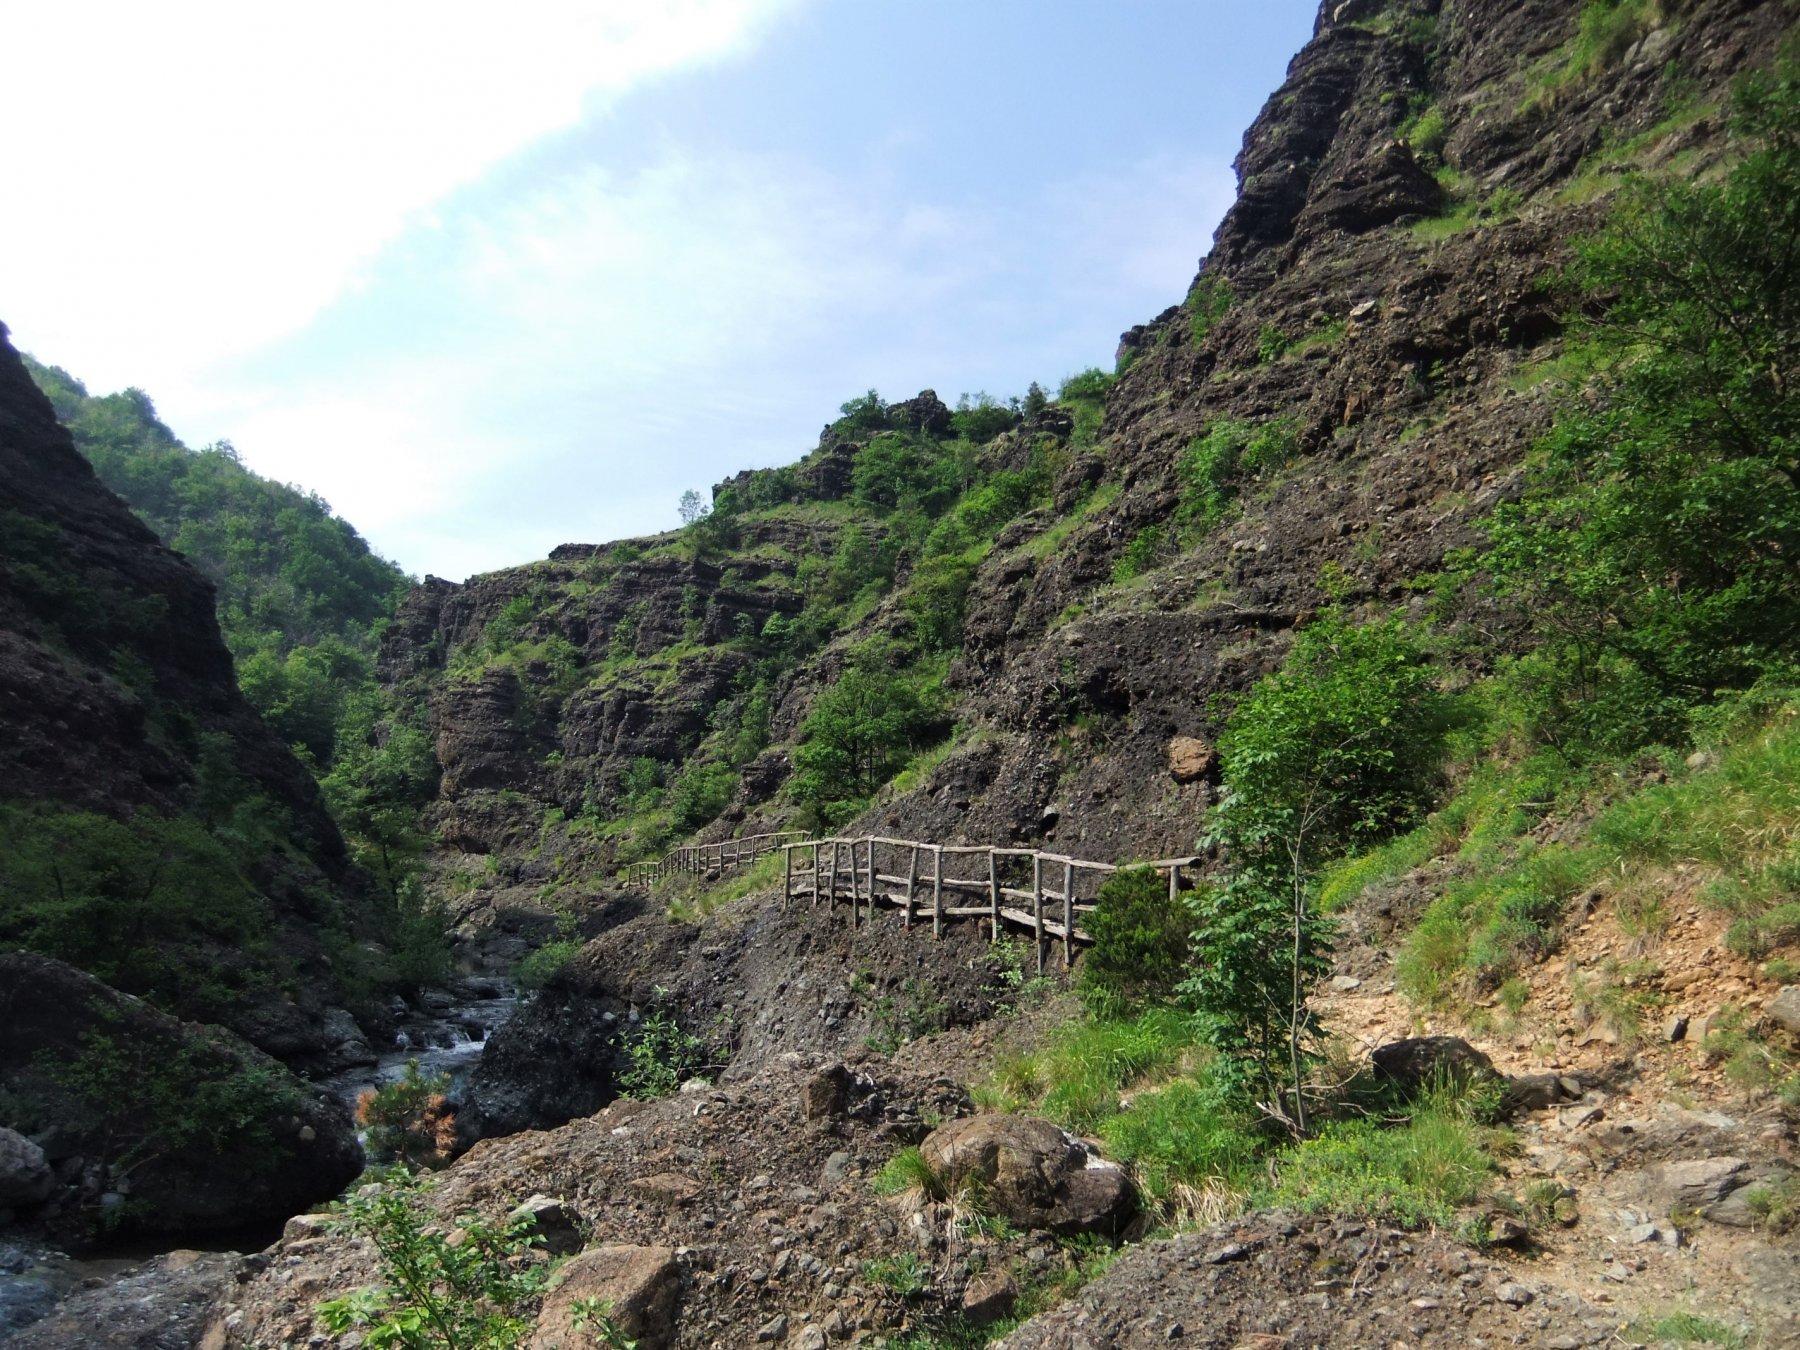 Sentiero in fondo al canyon